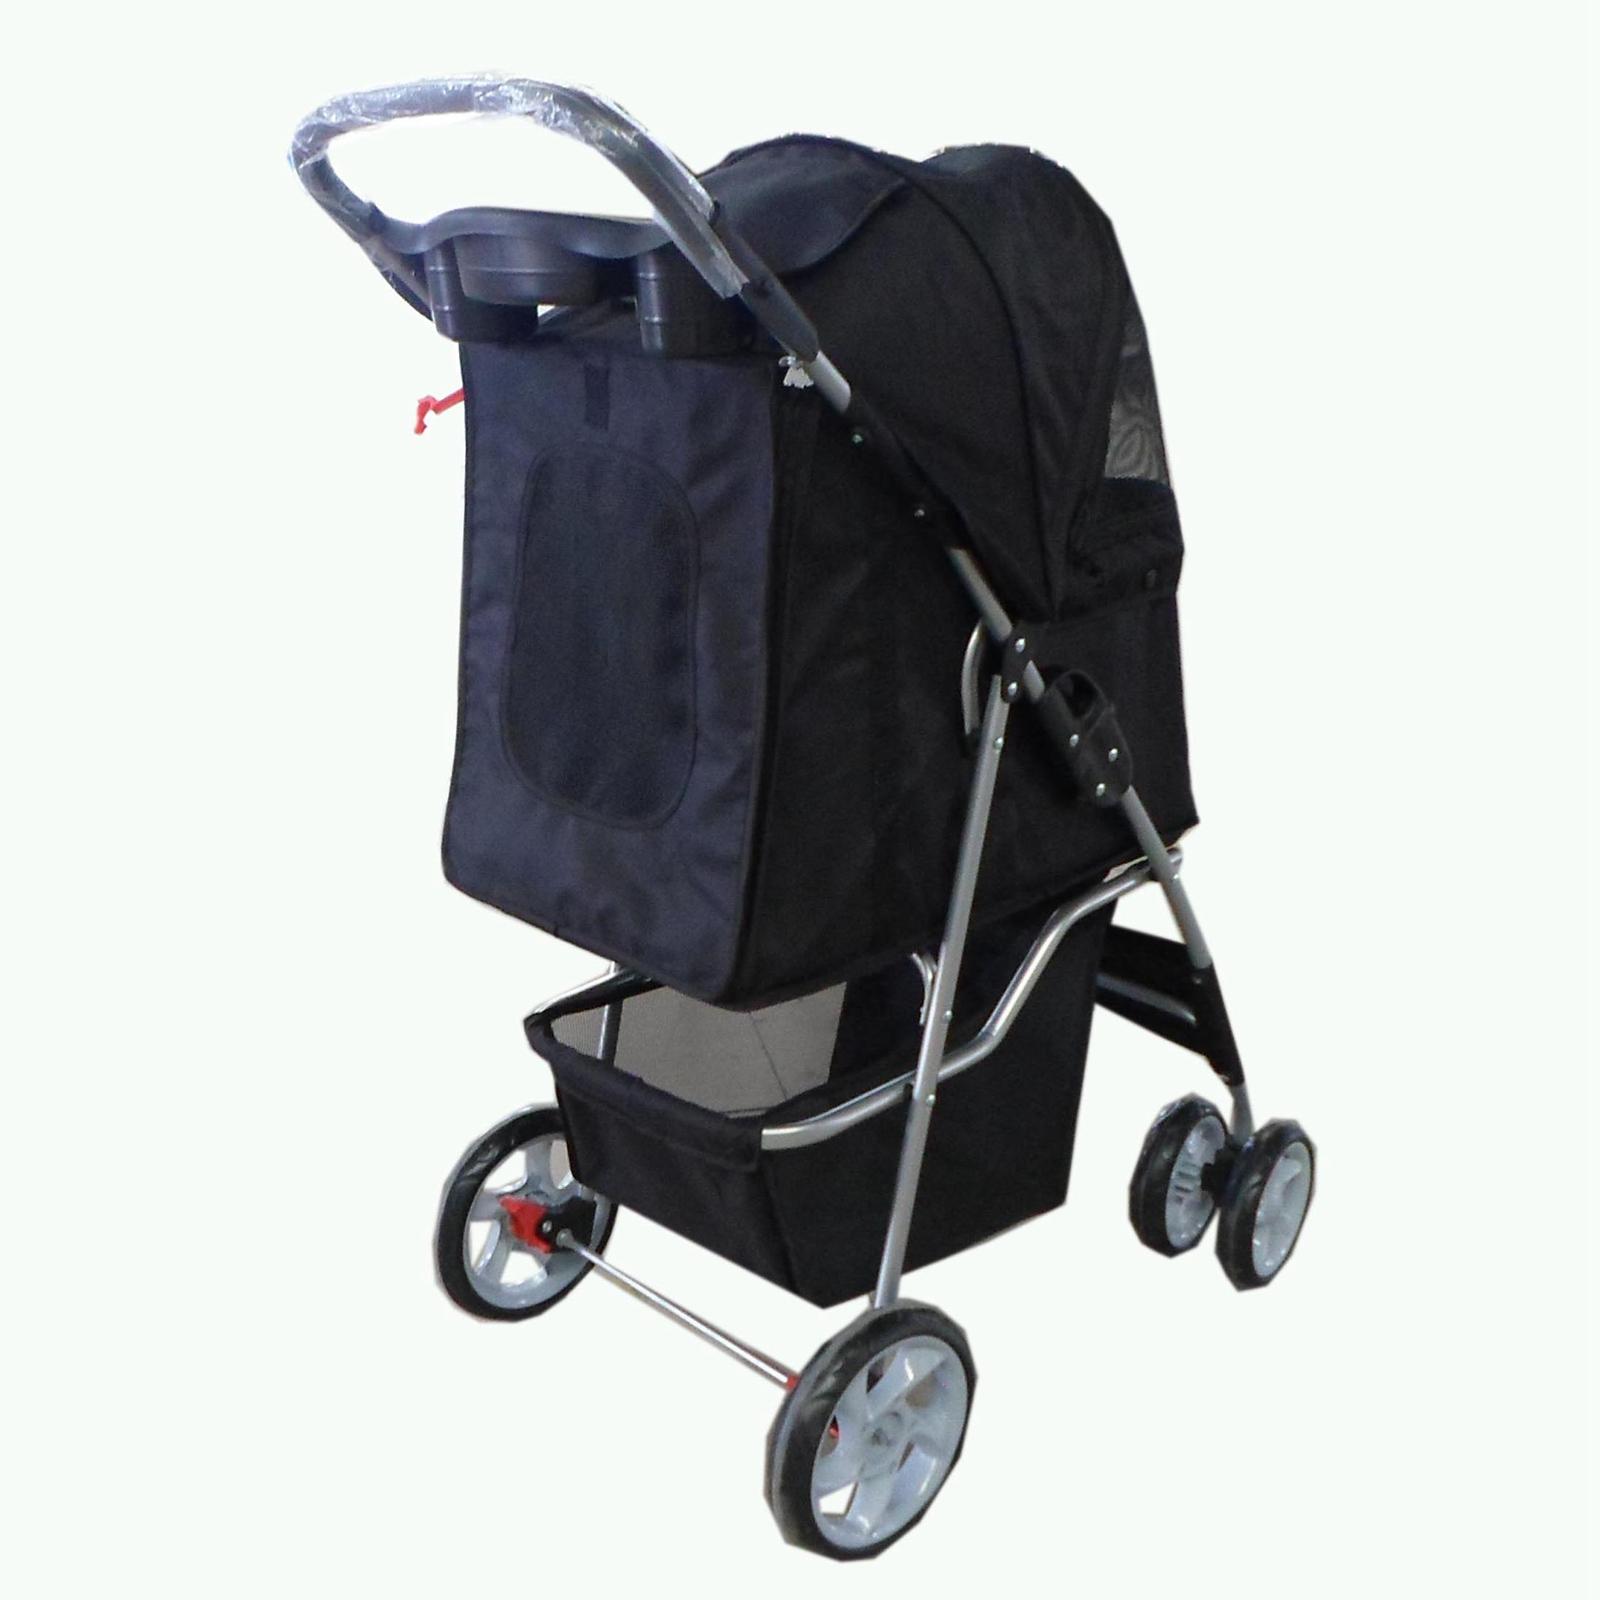 Pet Travel Stroller Pushchair Pram Jogger For Dogs Puppy